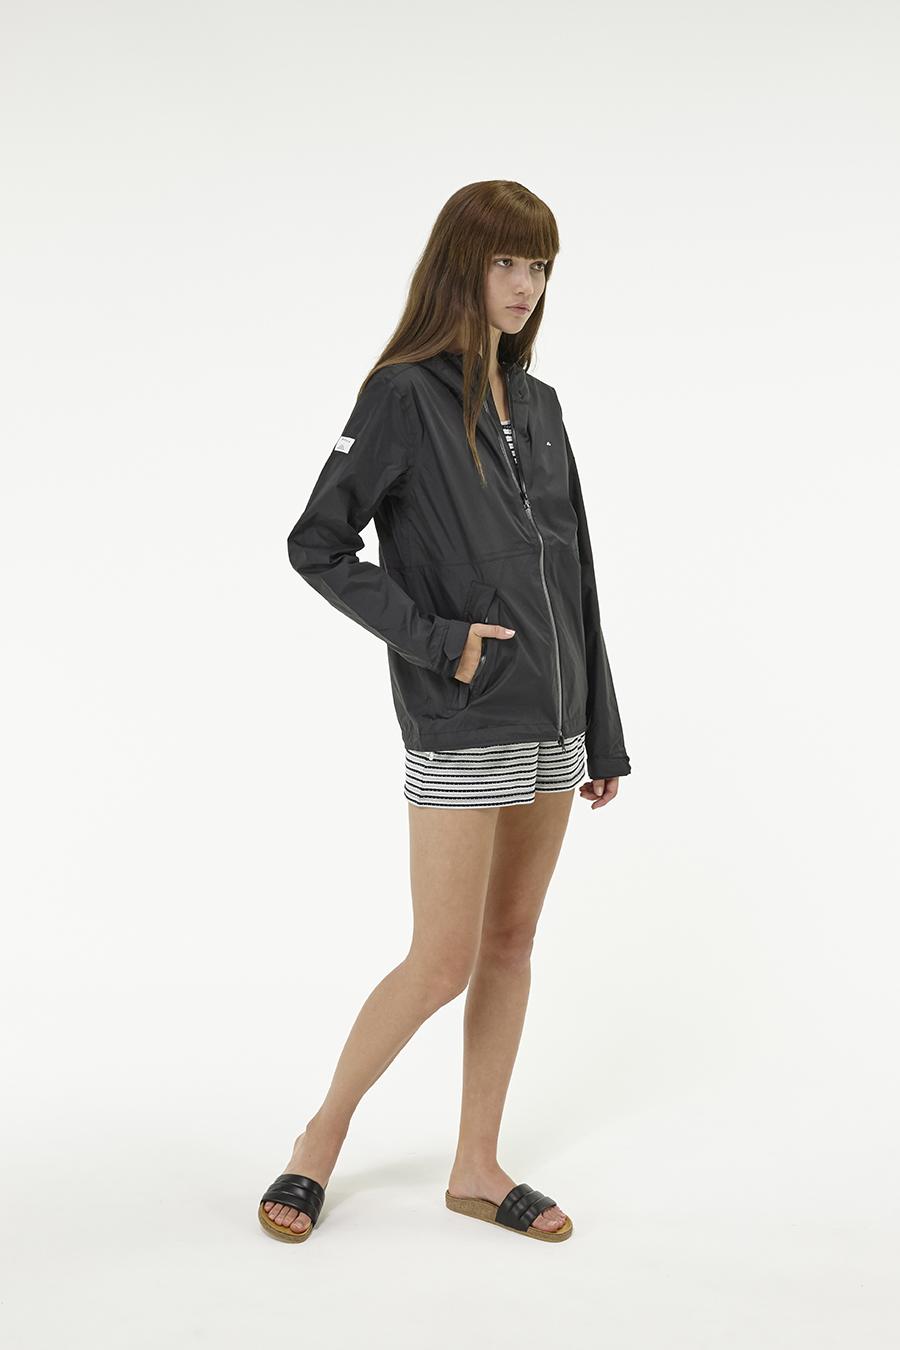 Huffer_Q3-16_W-Alpine-Jacket_Black-04